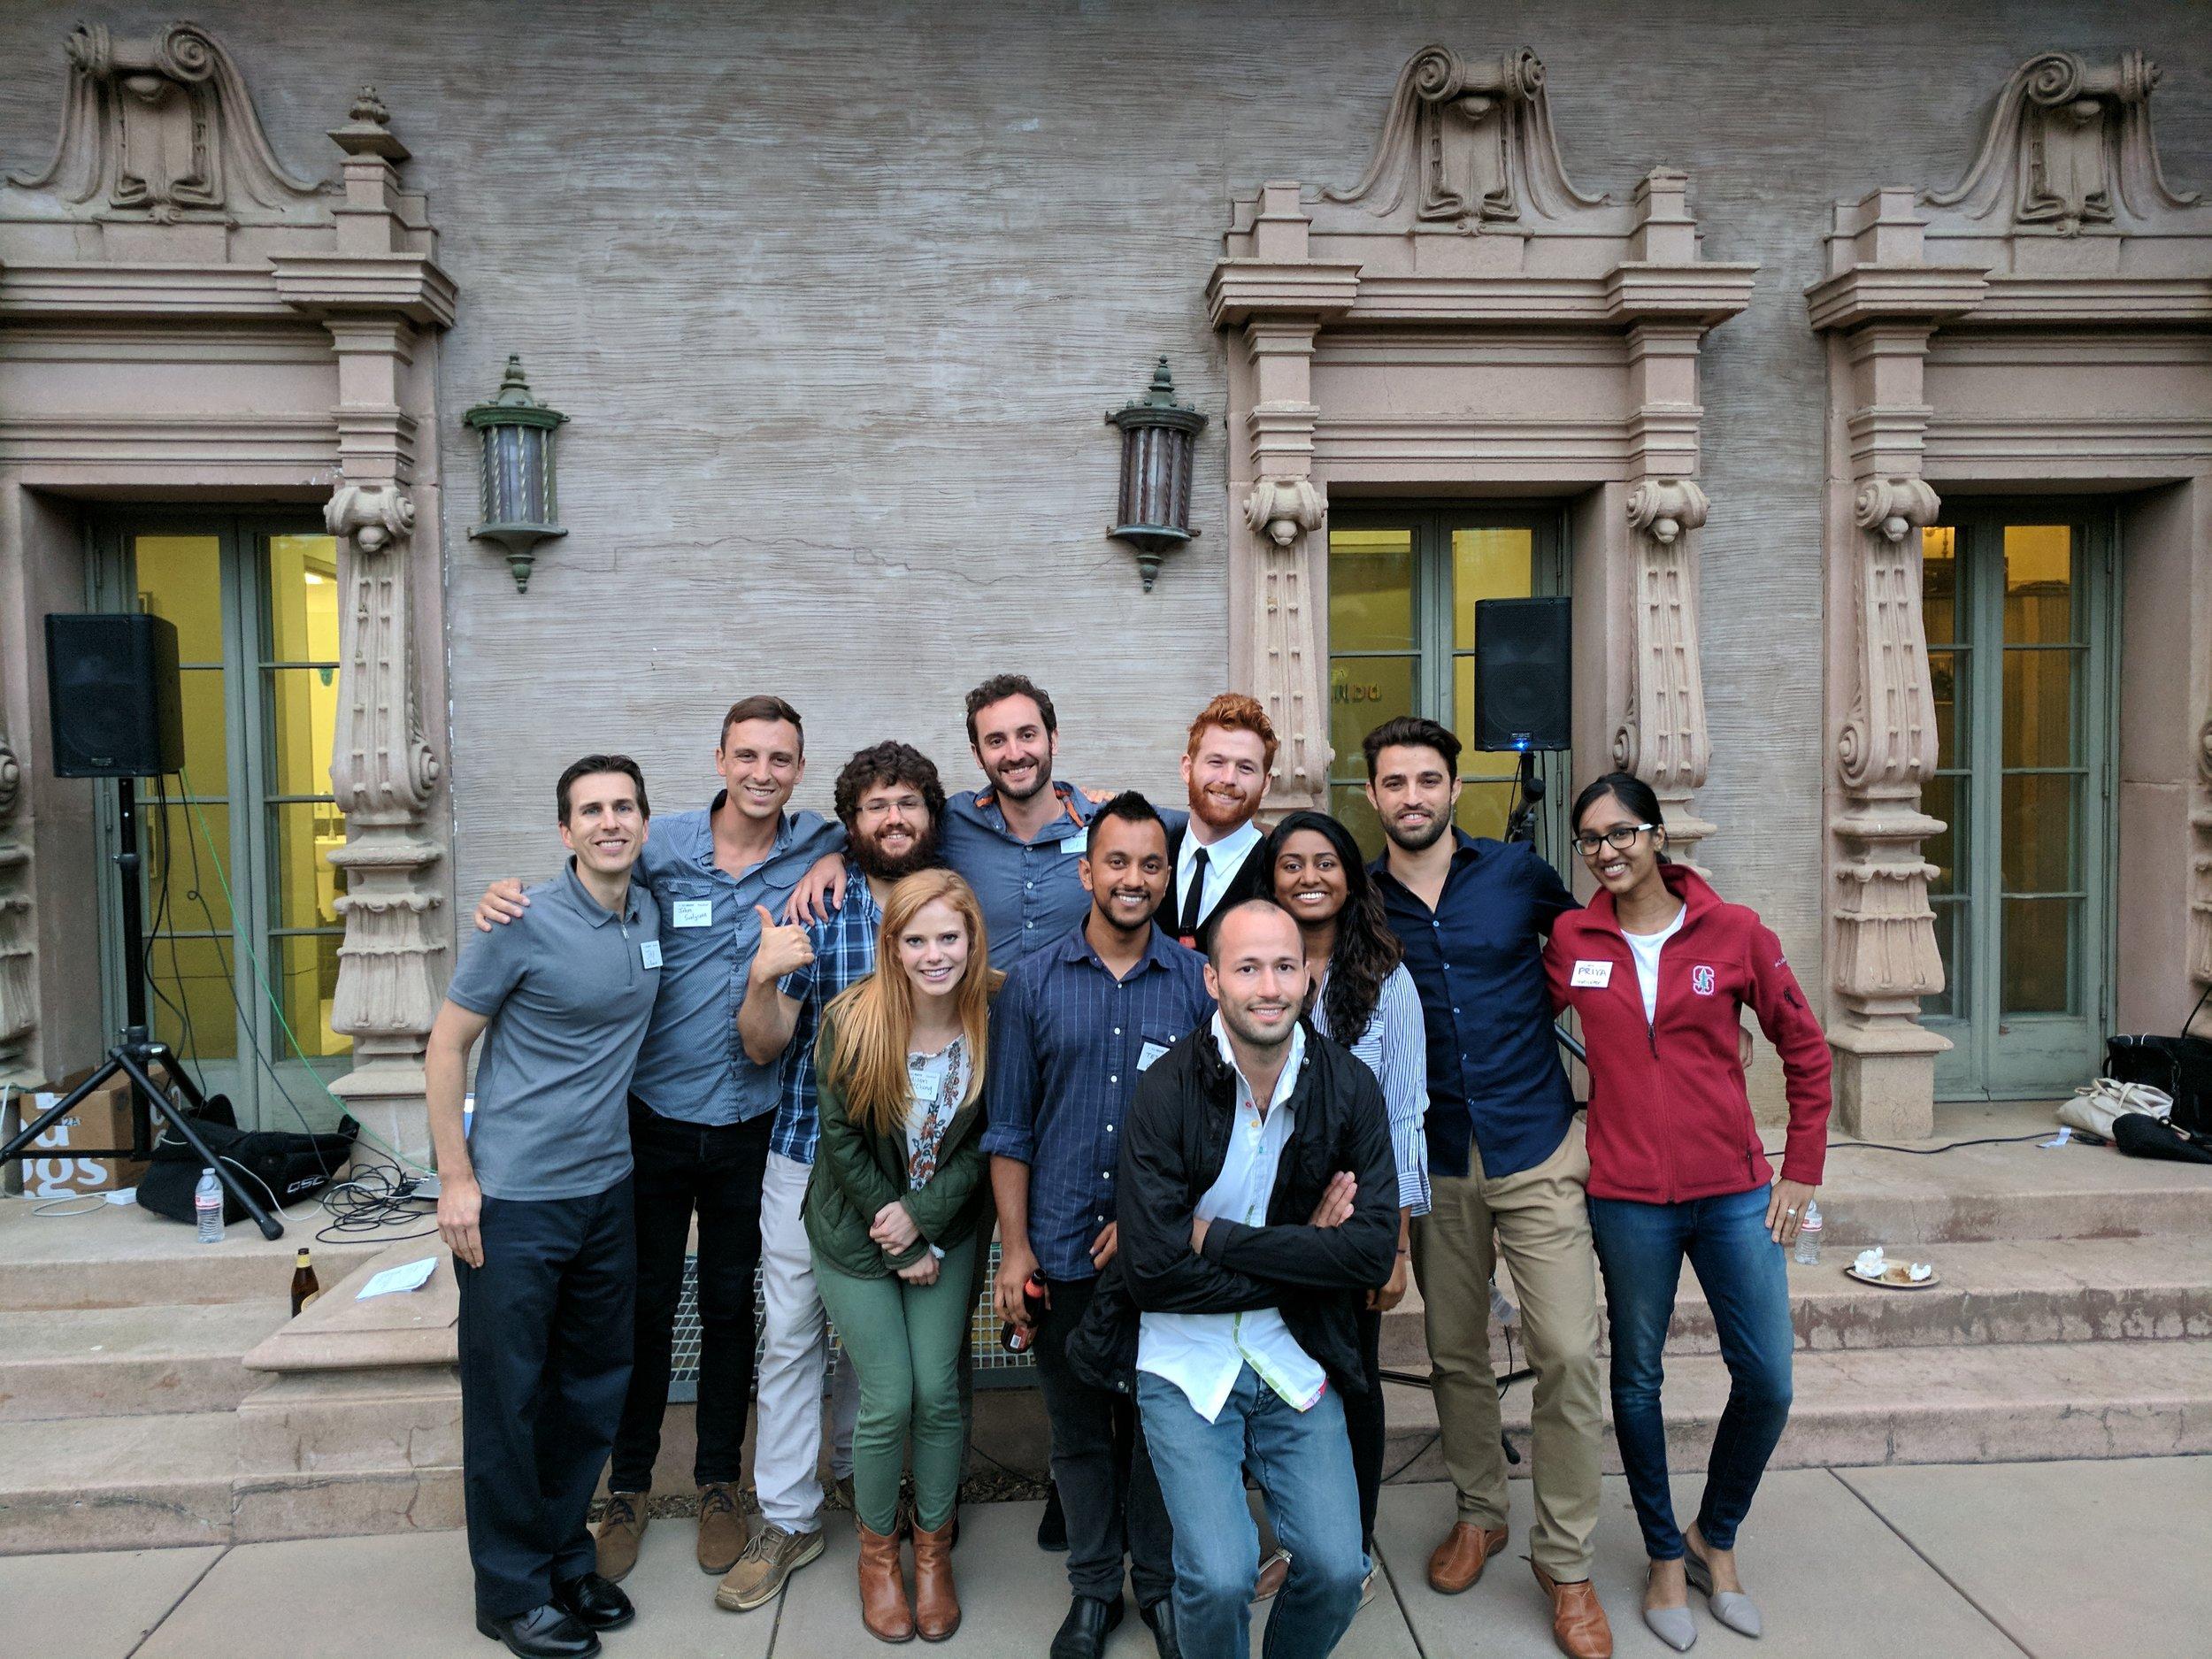 The Real Startup class: (back row from left) Jay LeBoeuf (staff), John Snelgrove, Yuval Adler, David Abrams, Matthew McIntyre, Wisam Reid, Priyanka Shekar (staff), (front row from left) Madison McClung, Tejaswi Gorti, Itamar Orr, Eesha Choudhari (TA)